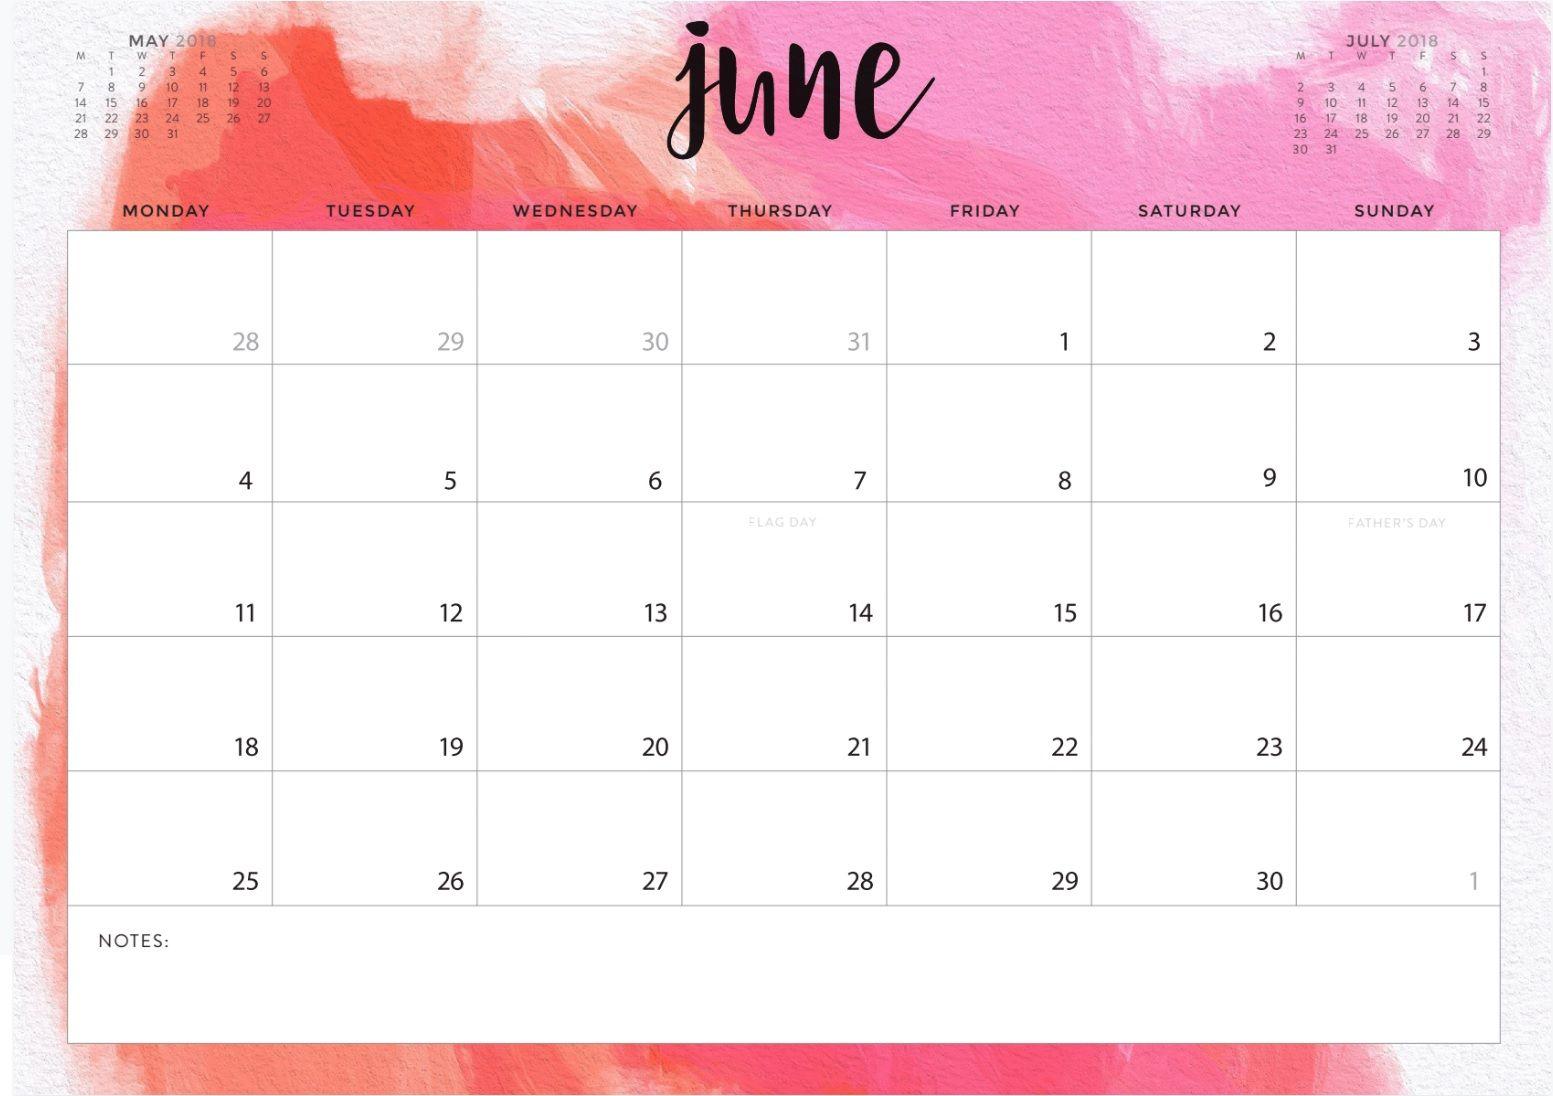 Stylish June Month 2018 Calendar Designs Calendar Design